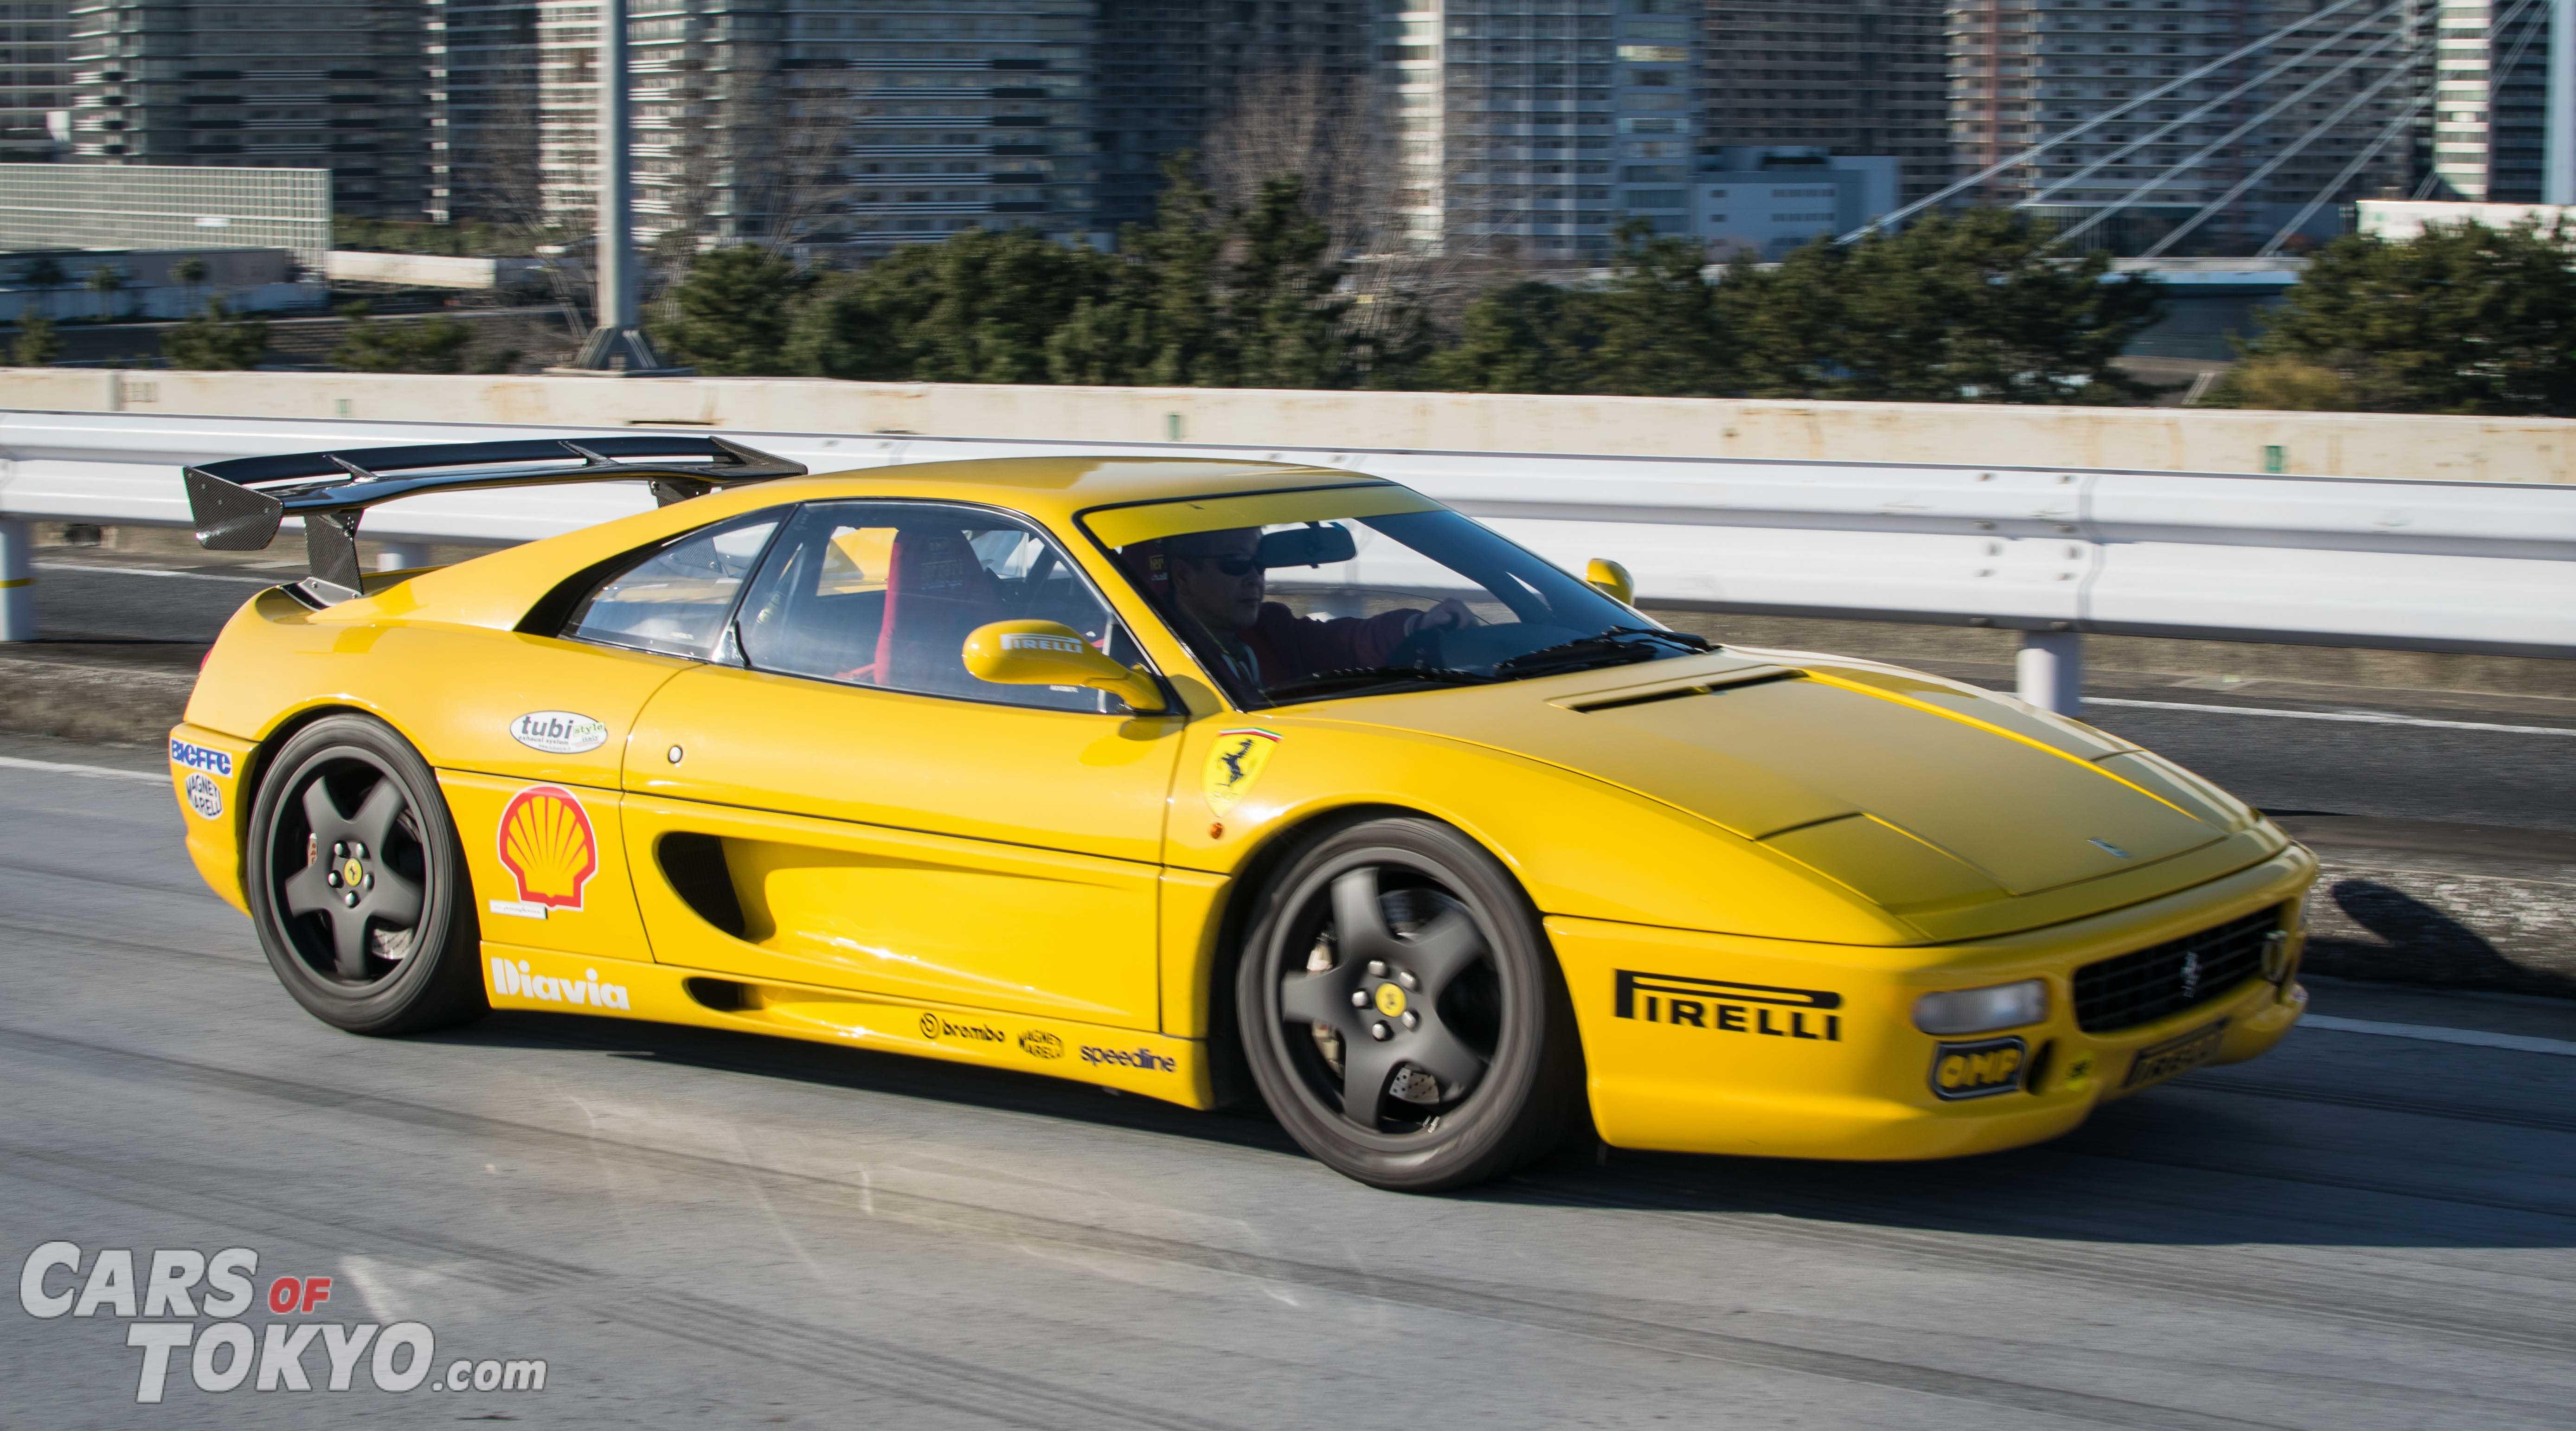 Cars of Tokyo Tatsumi Ferrari 355 Challenge